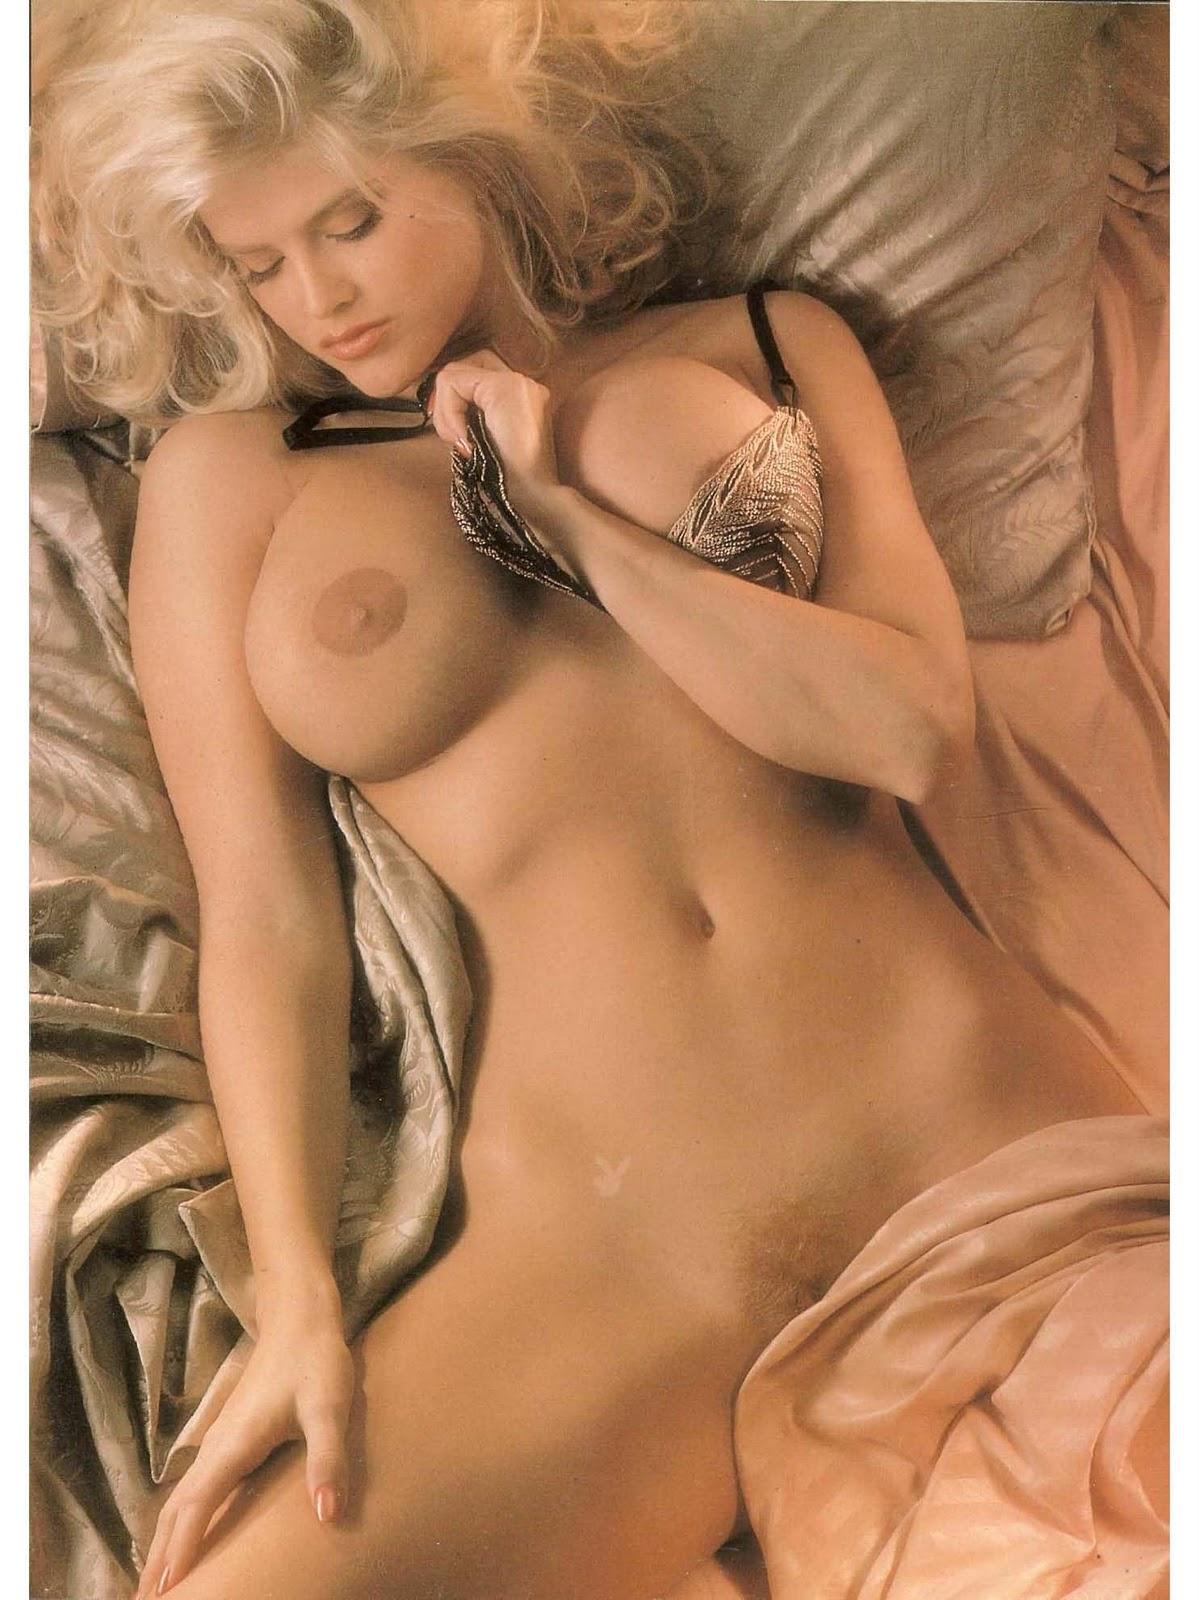 http://2.bp.blogspot.com/-75NjJ0wMh84/ToRr8LcCovI/AAAAAAAAGgA/aWoEGujvIuA/s1600/199206_ES_PB_P%25C3%25A1gina_052_Anna-Nicole_Smith_Layout.jpg